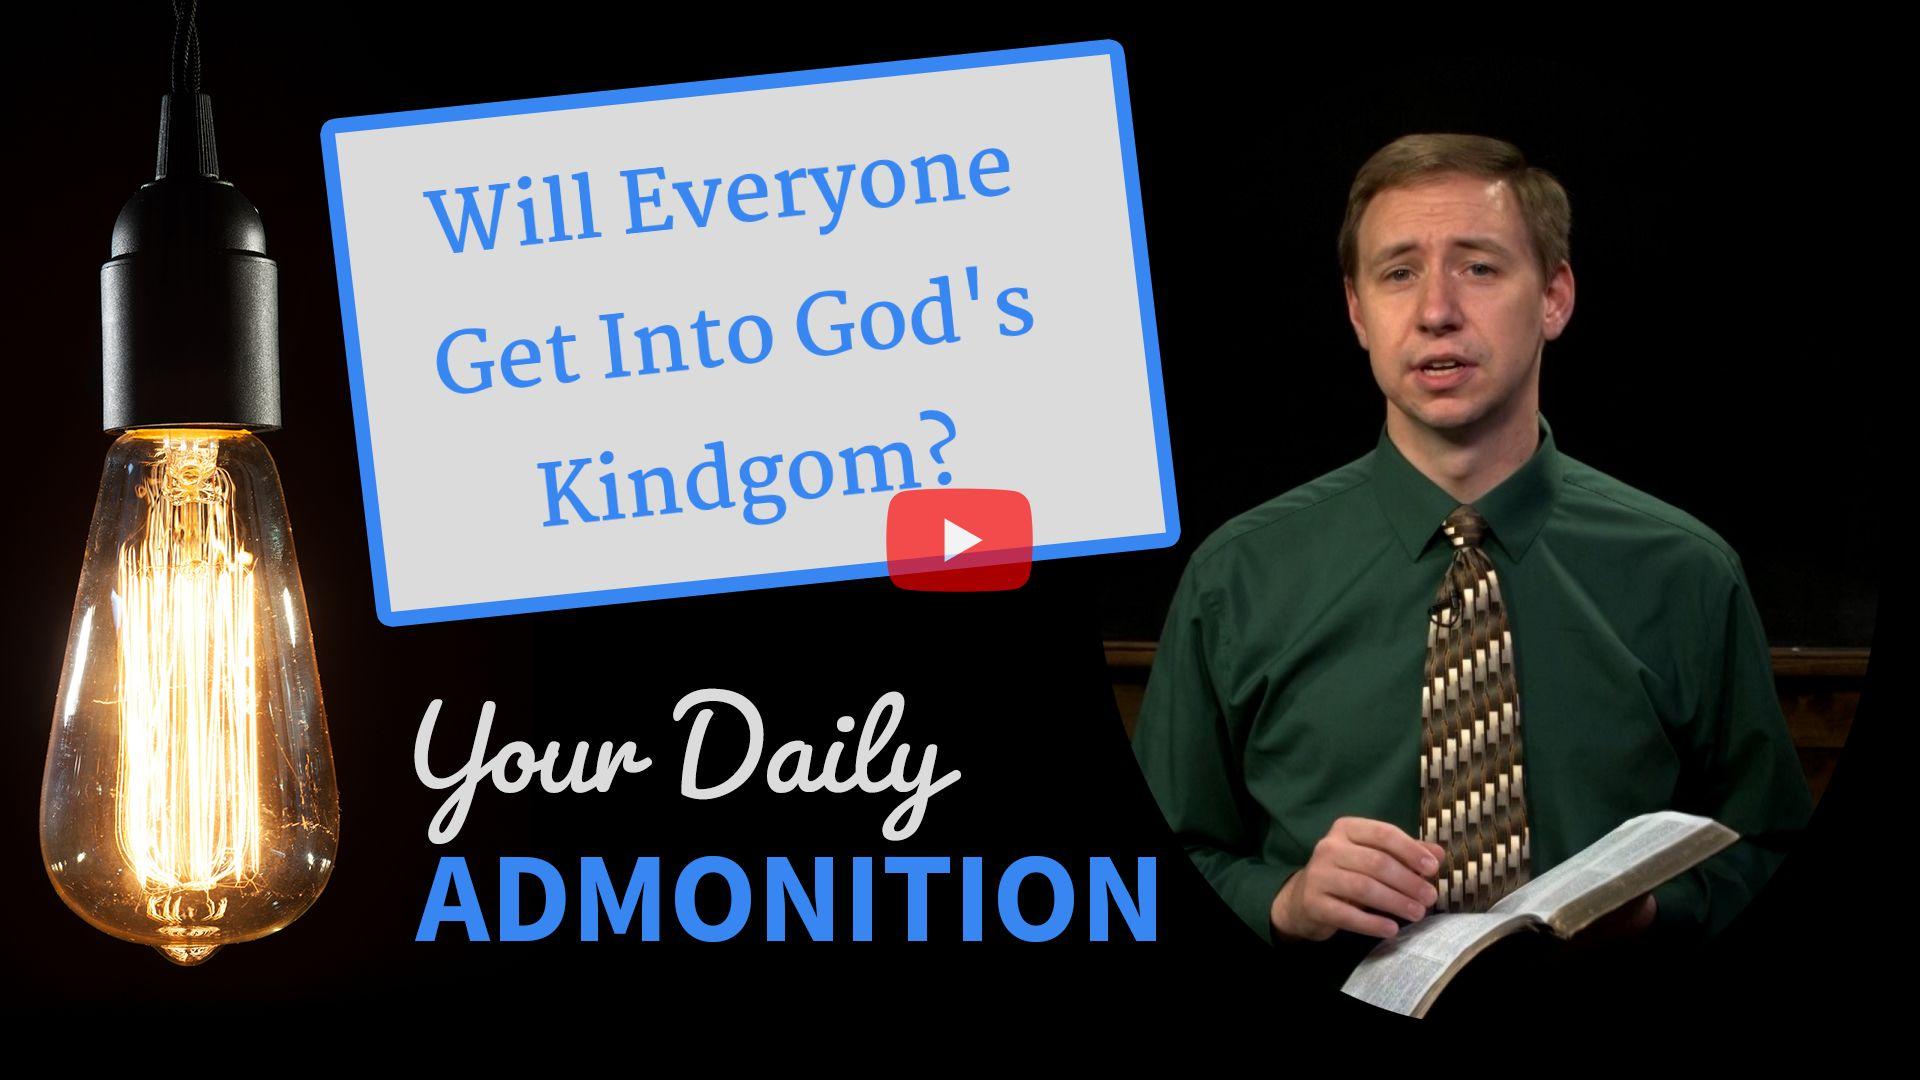 Will Everyone Get Into God's Kindgom?